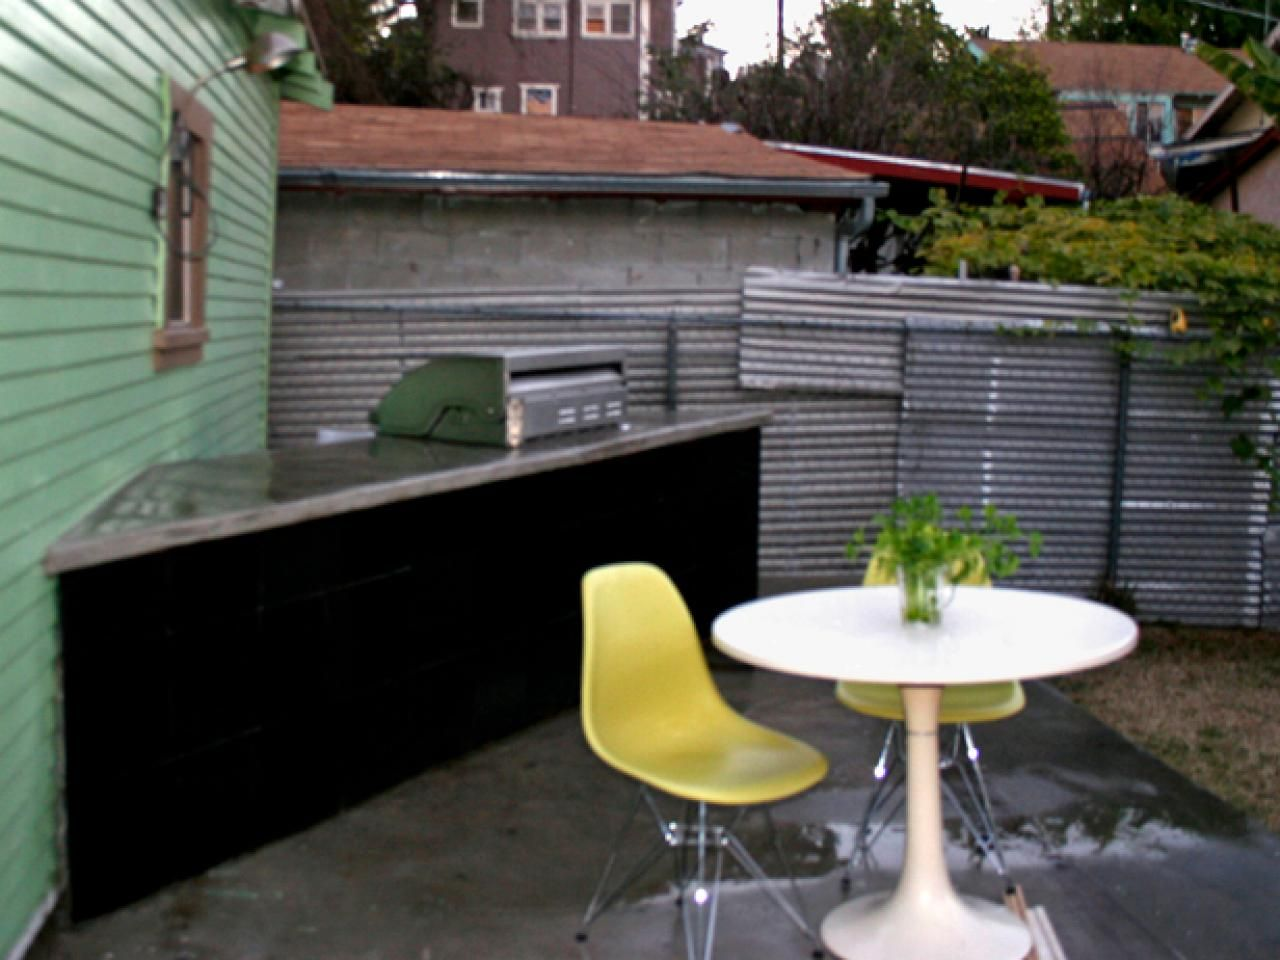 Outdoor Küche Beton Arbeitsplatte : Beton arbeitsplatten outdoor küche insel mit arbeitsplatte